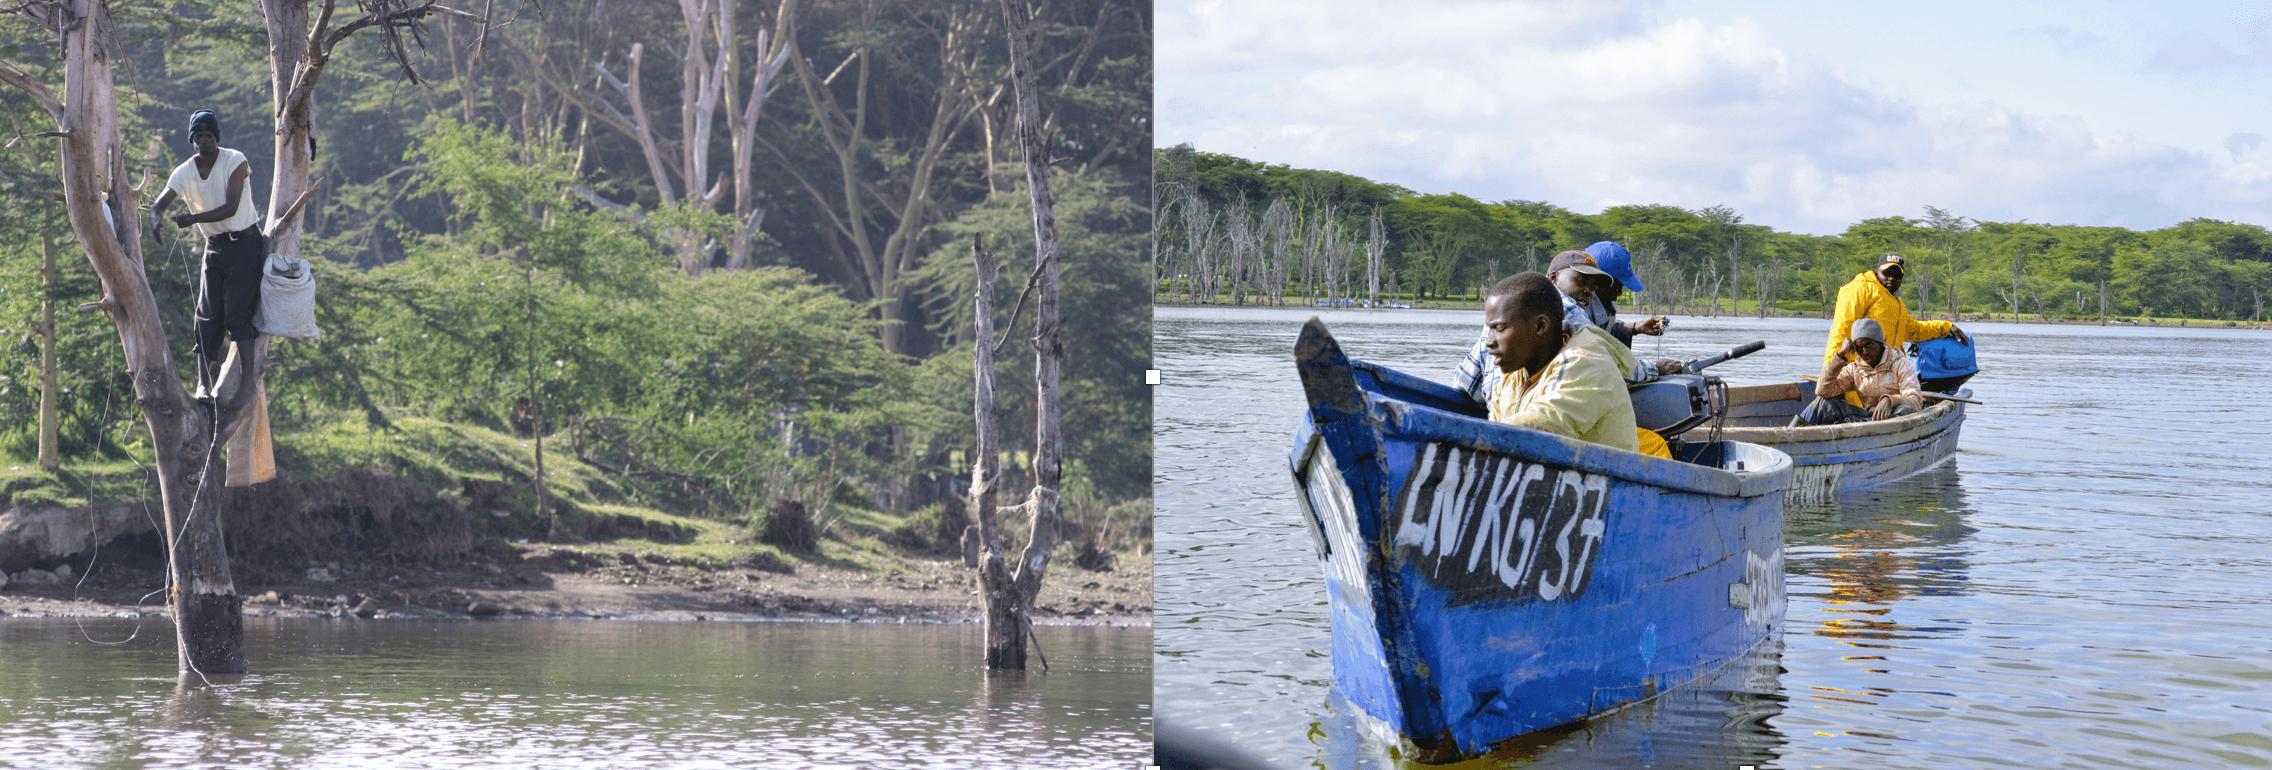 gente pescando lago Naivasha